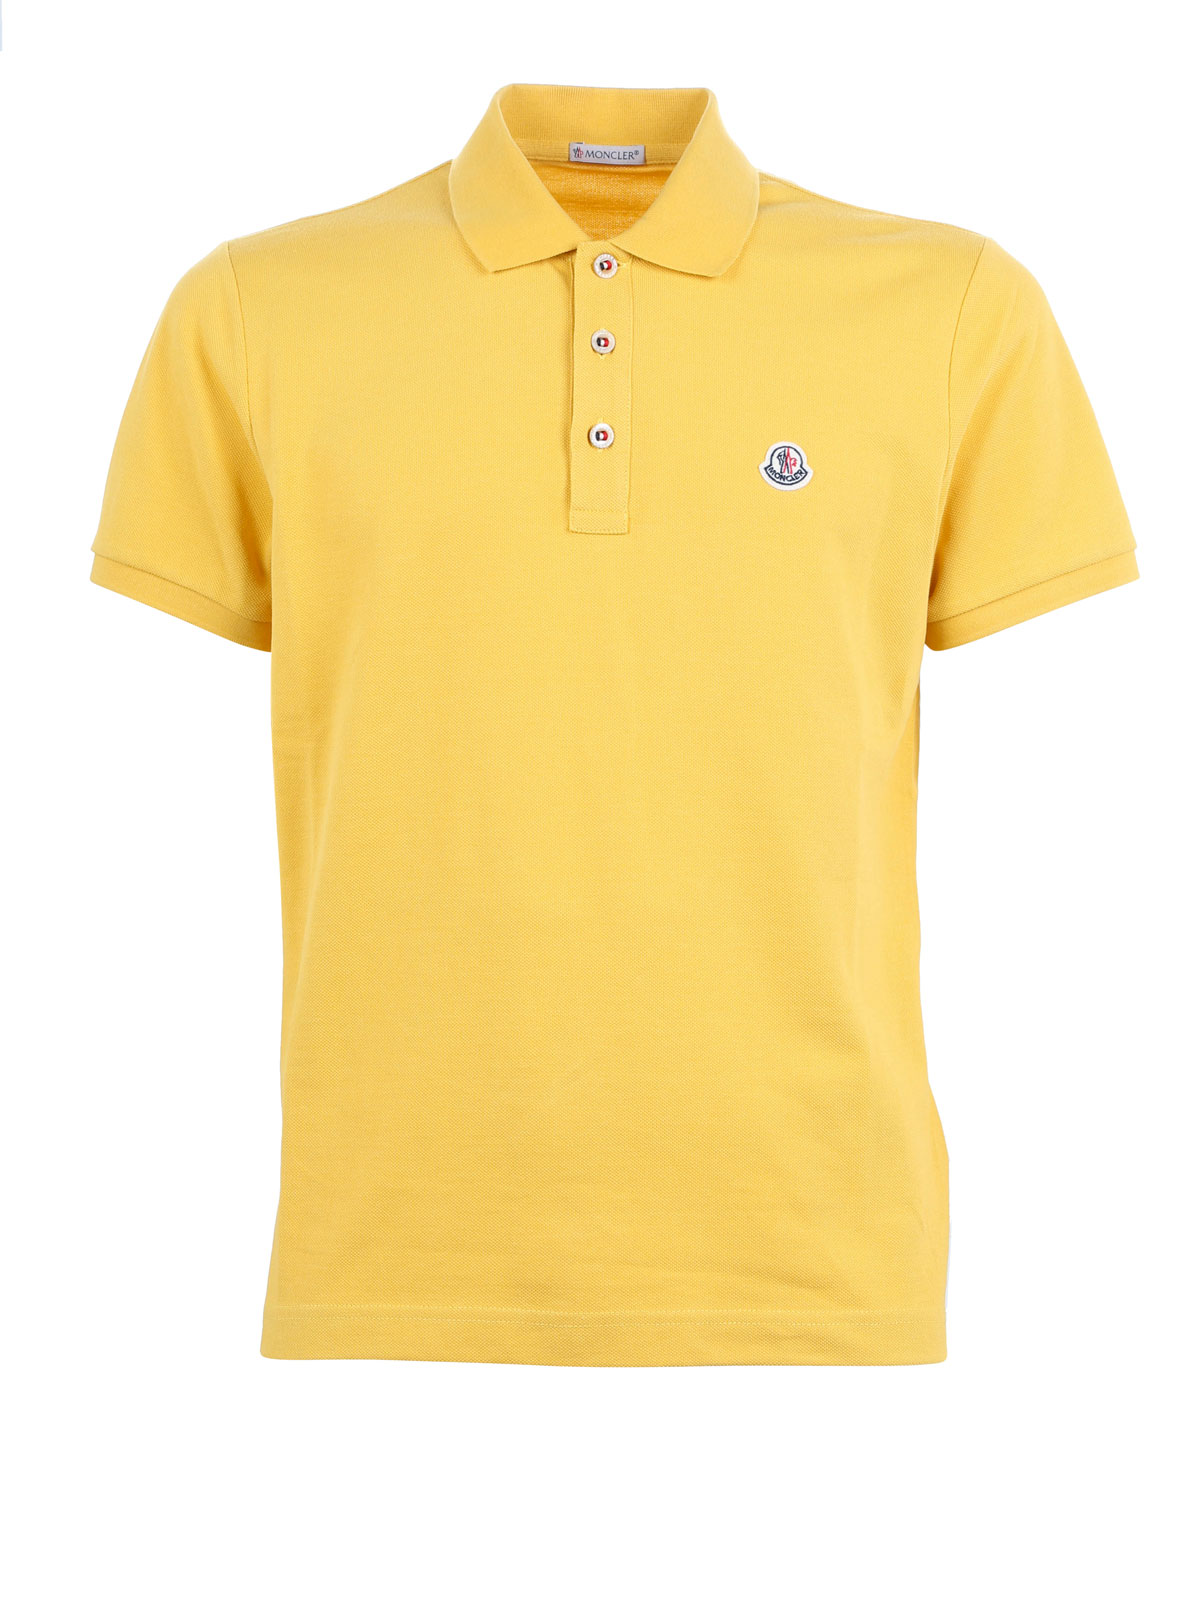 Moncler Poloshirt Fur Herren Gelb Poloshirts B1 091